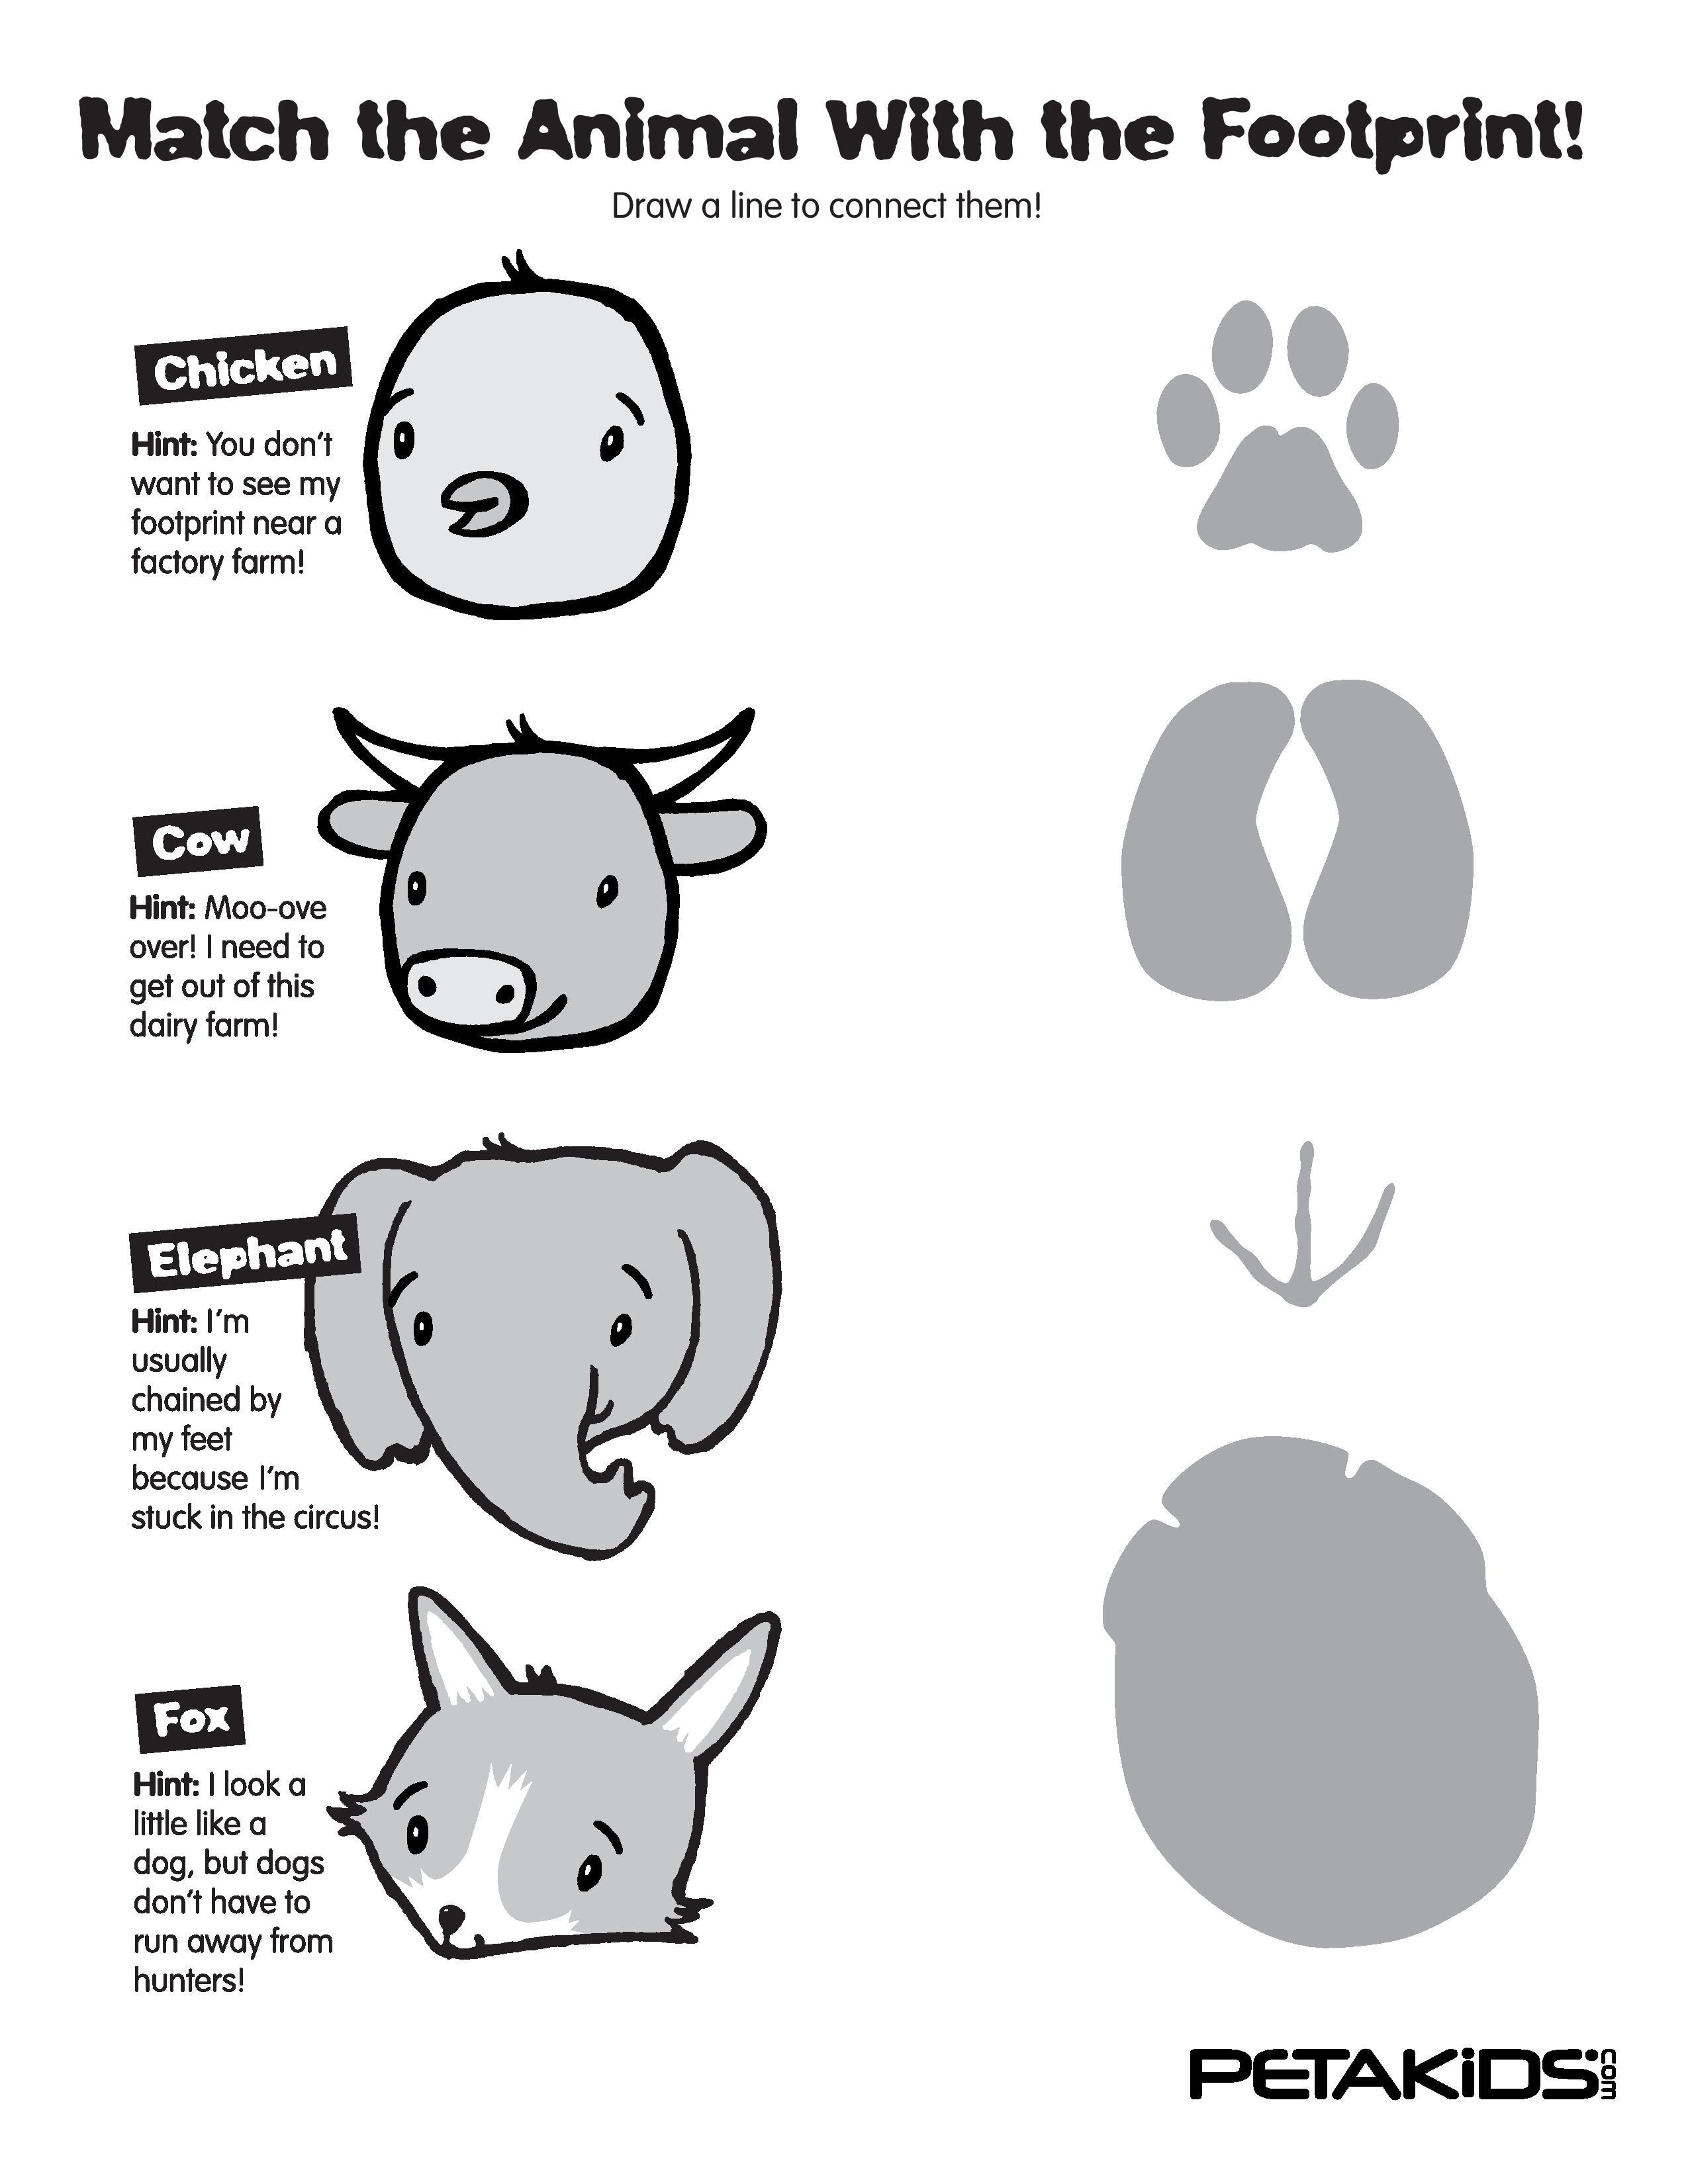 Animal Footprints Match Them All